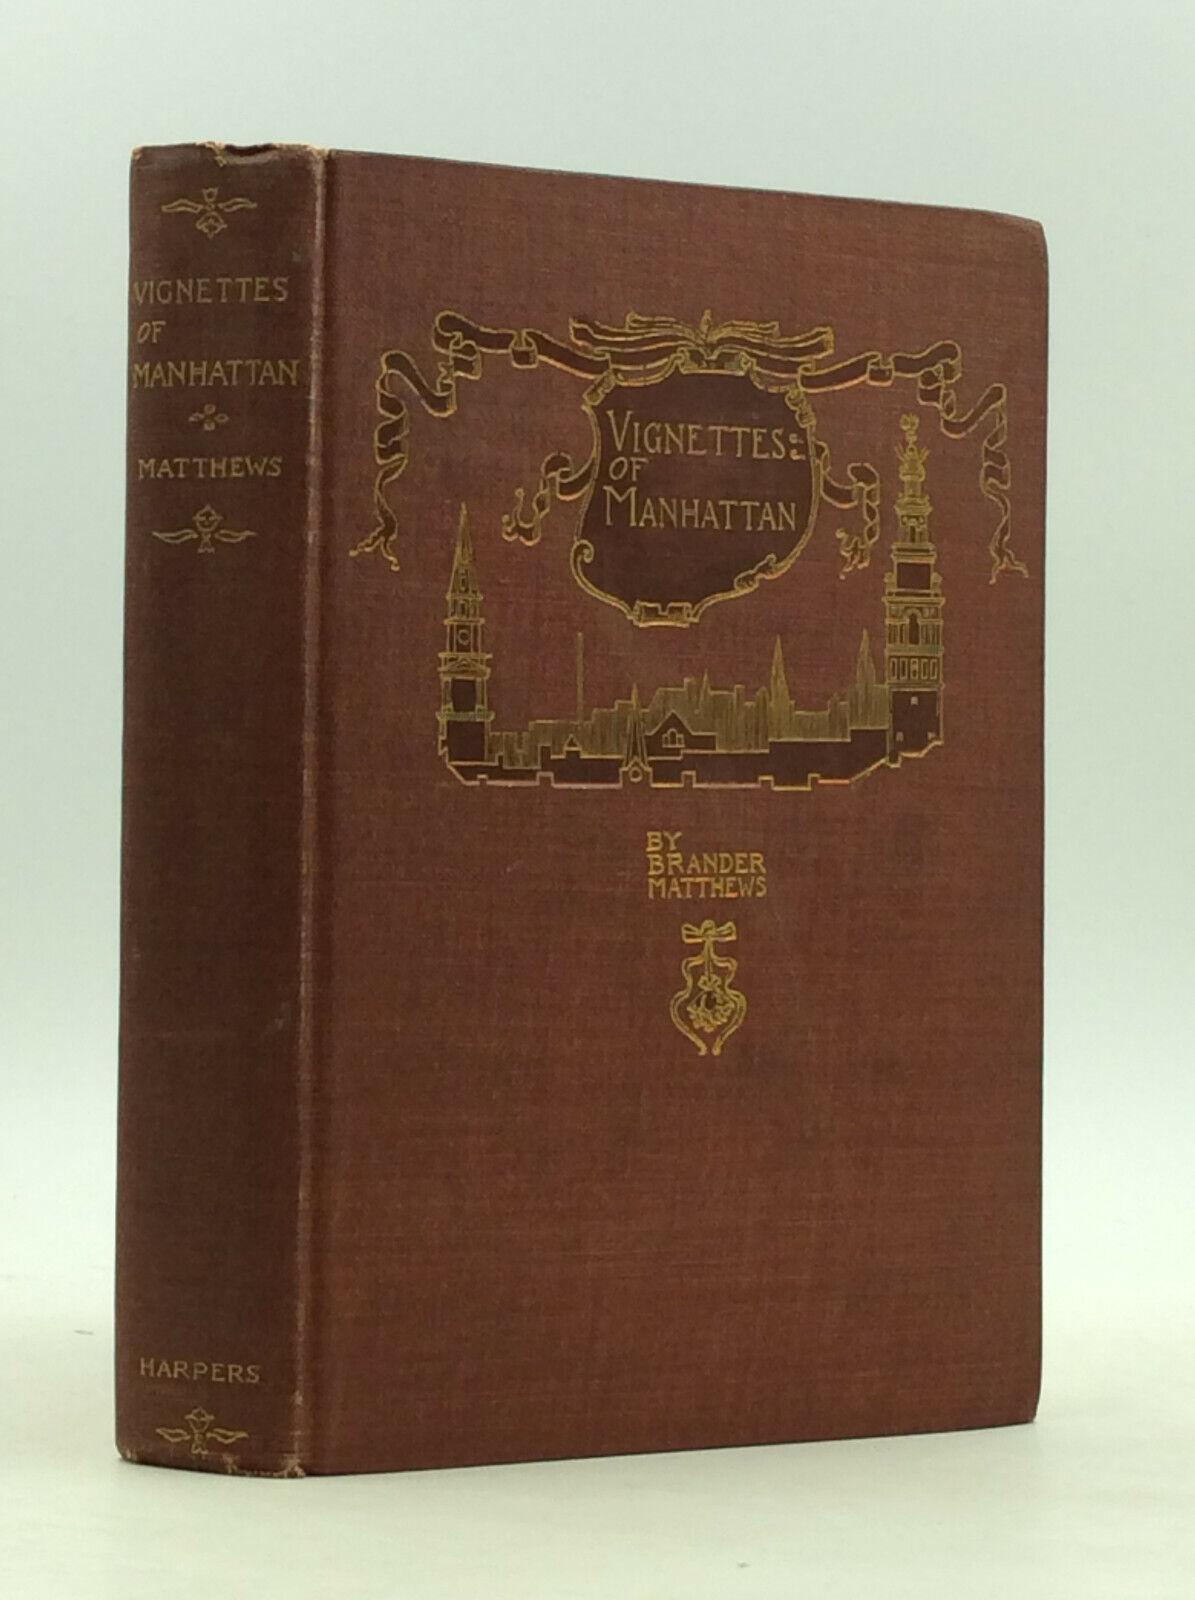 VIGNETTES OF MANHATTAN by Brander Matthews - 1894 - New York City life